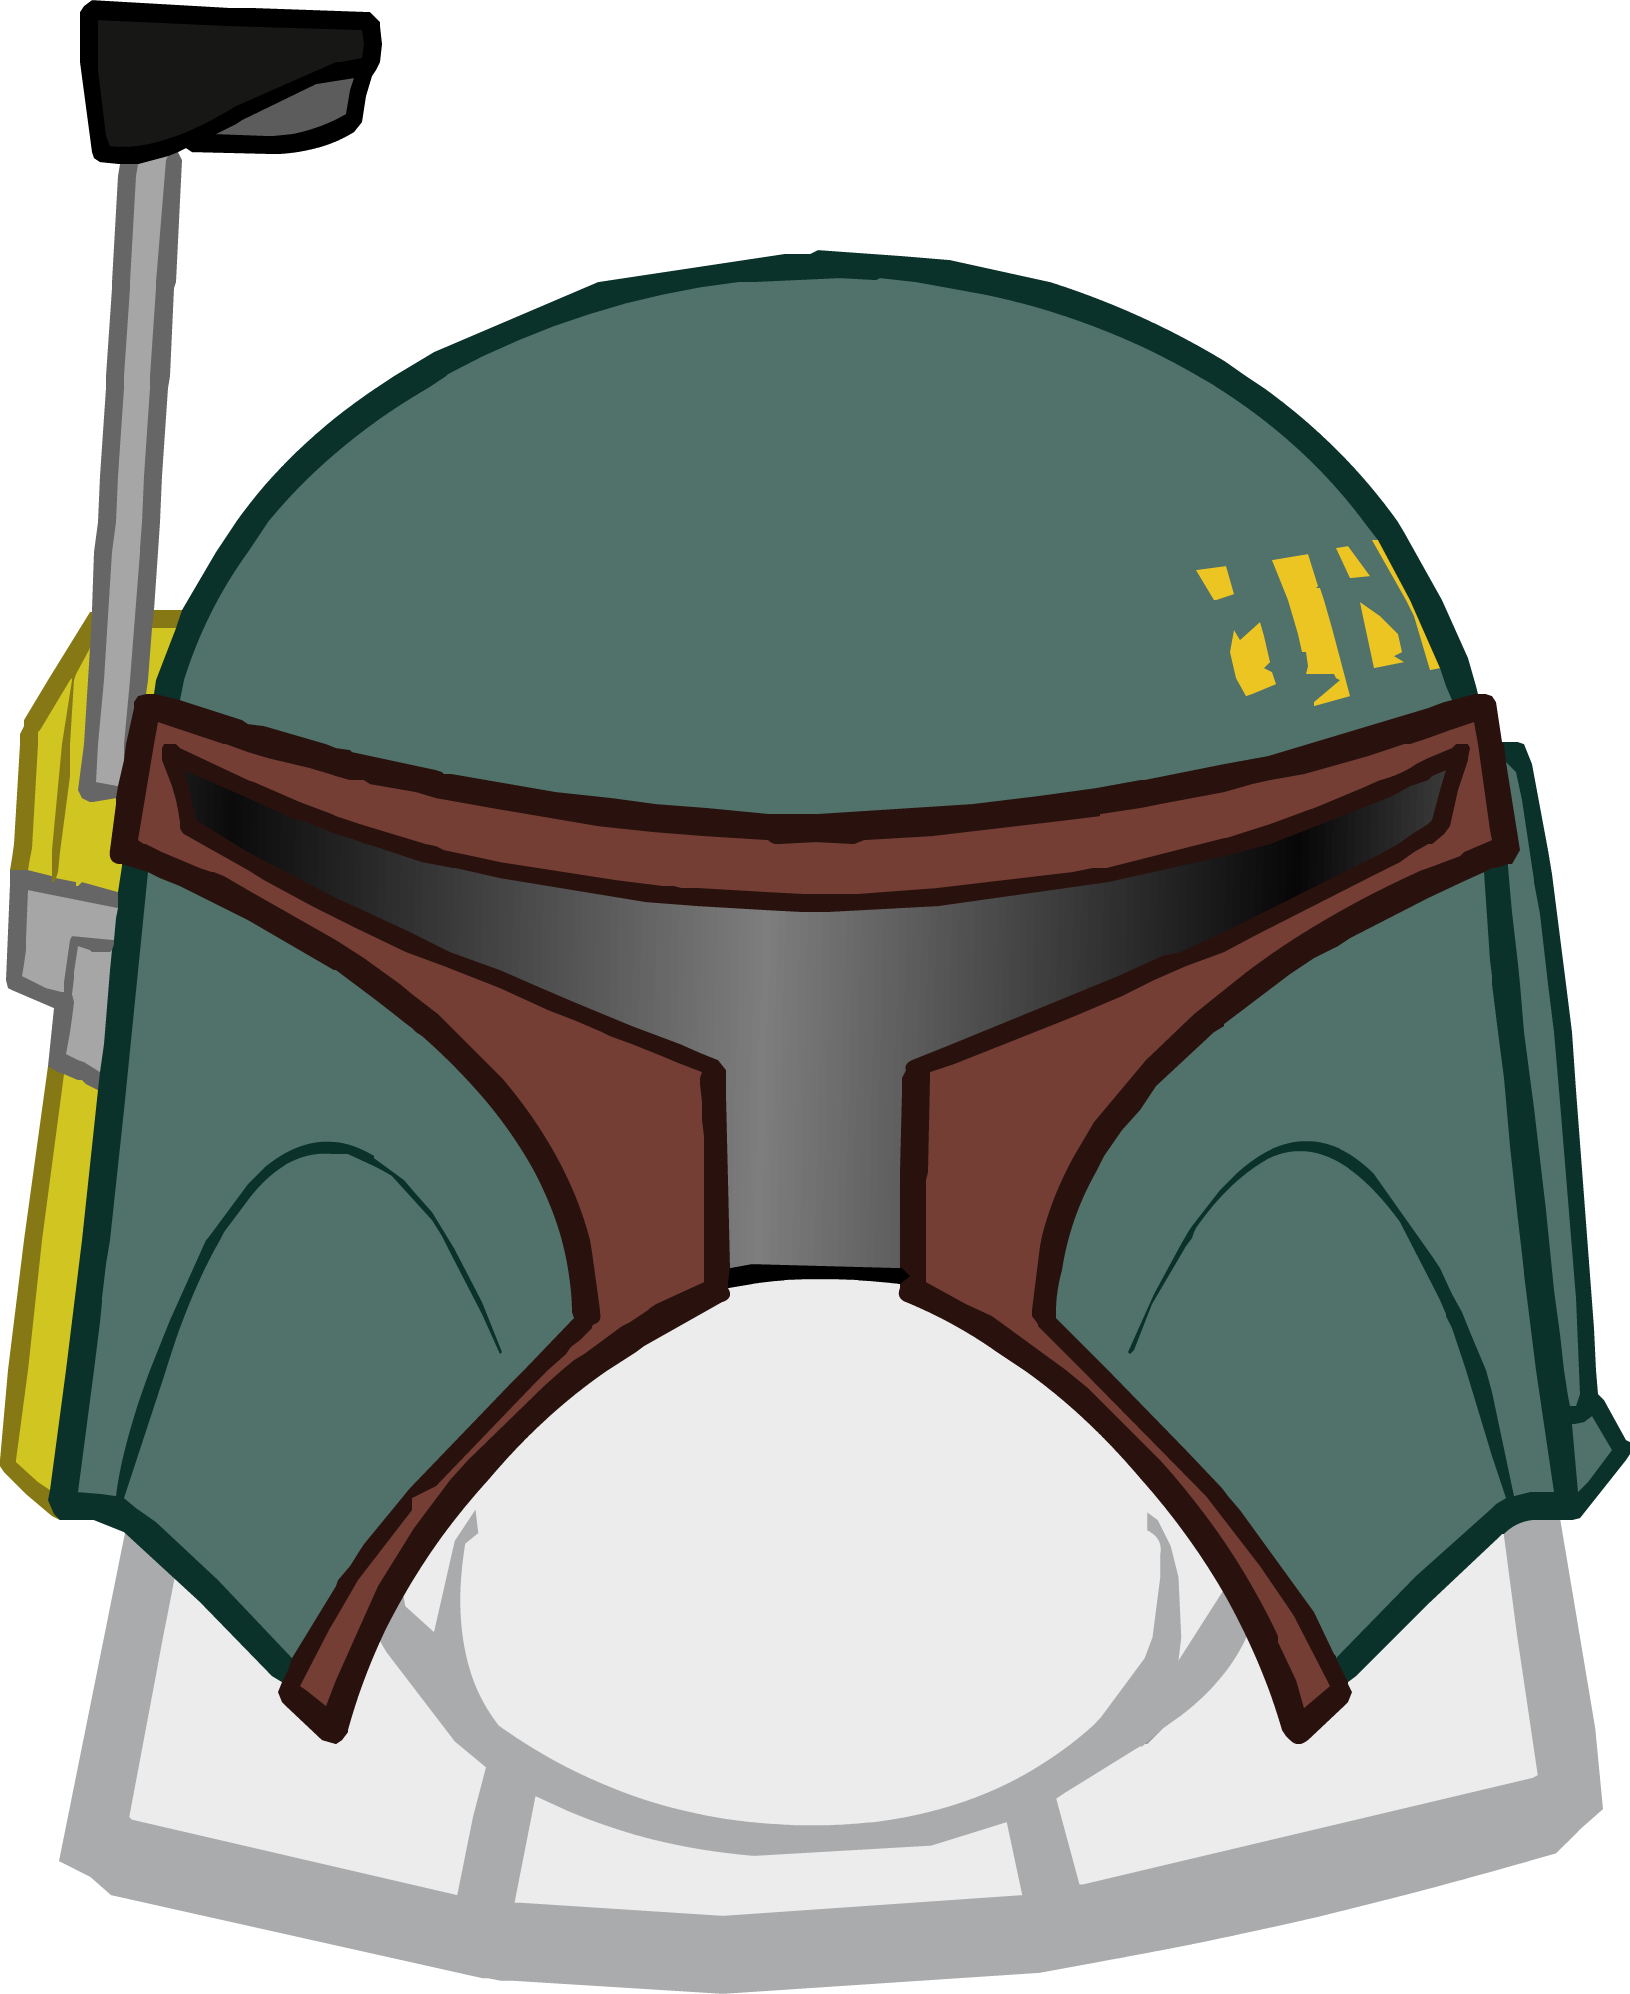 Star wars boba fett clipart graphic freeuse library Boba Fett Helmet | Club Penguin Wiki | FANDOM powered by Wikia graphic freeuse library